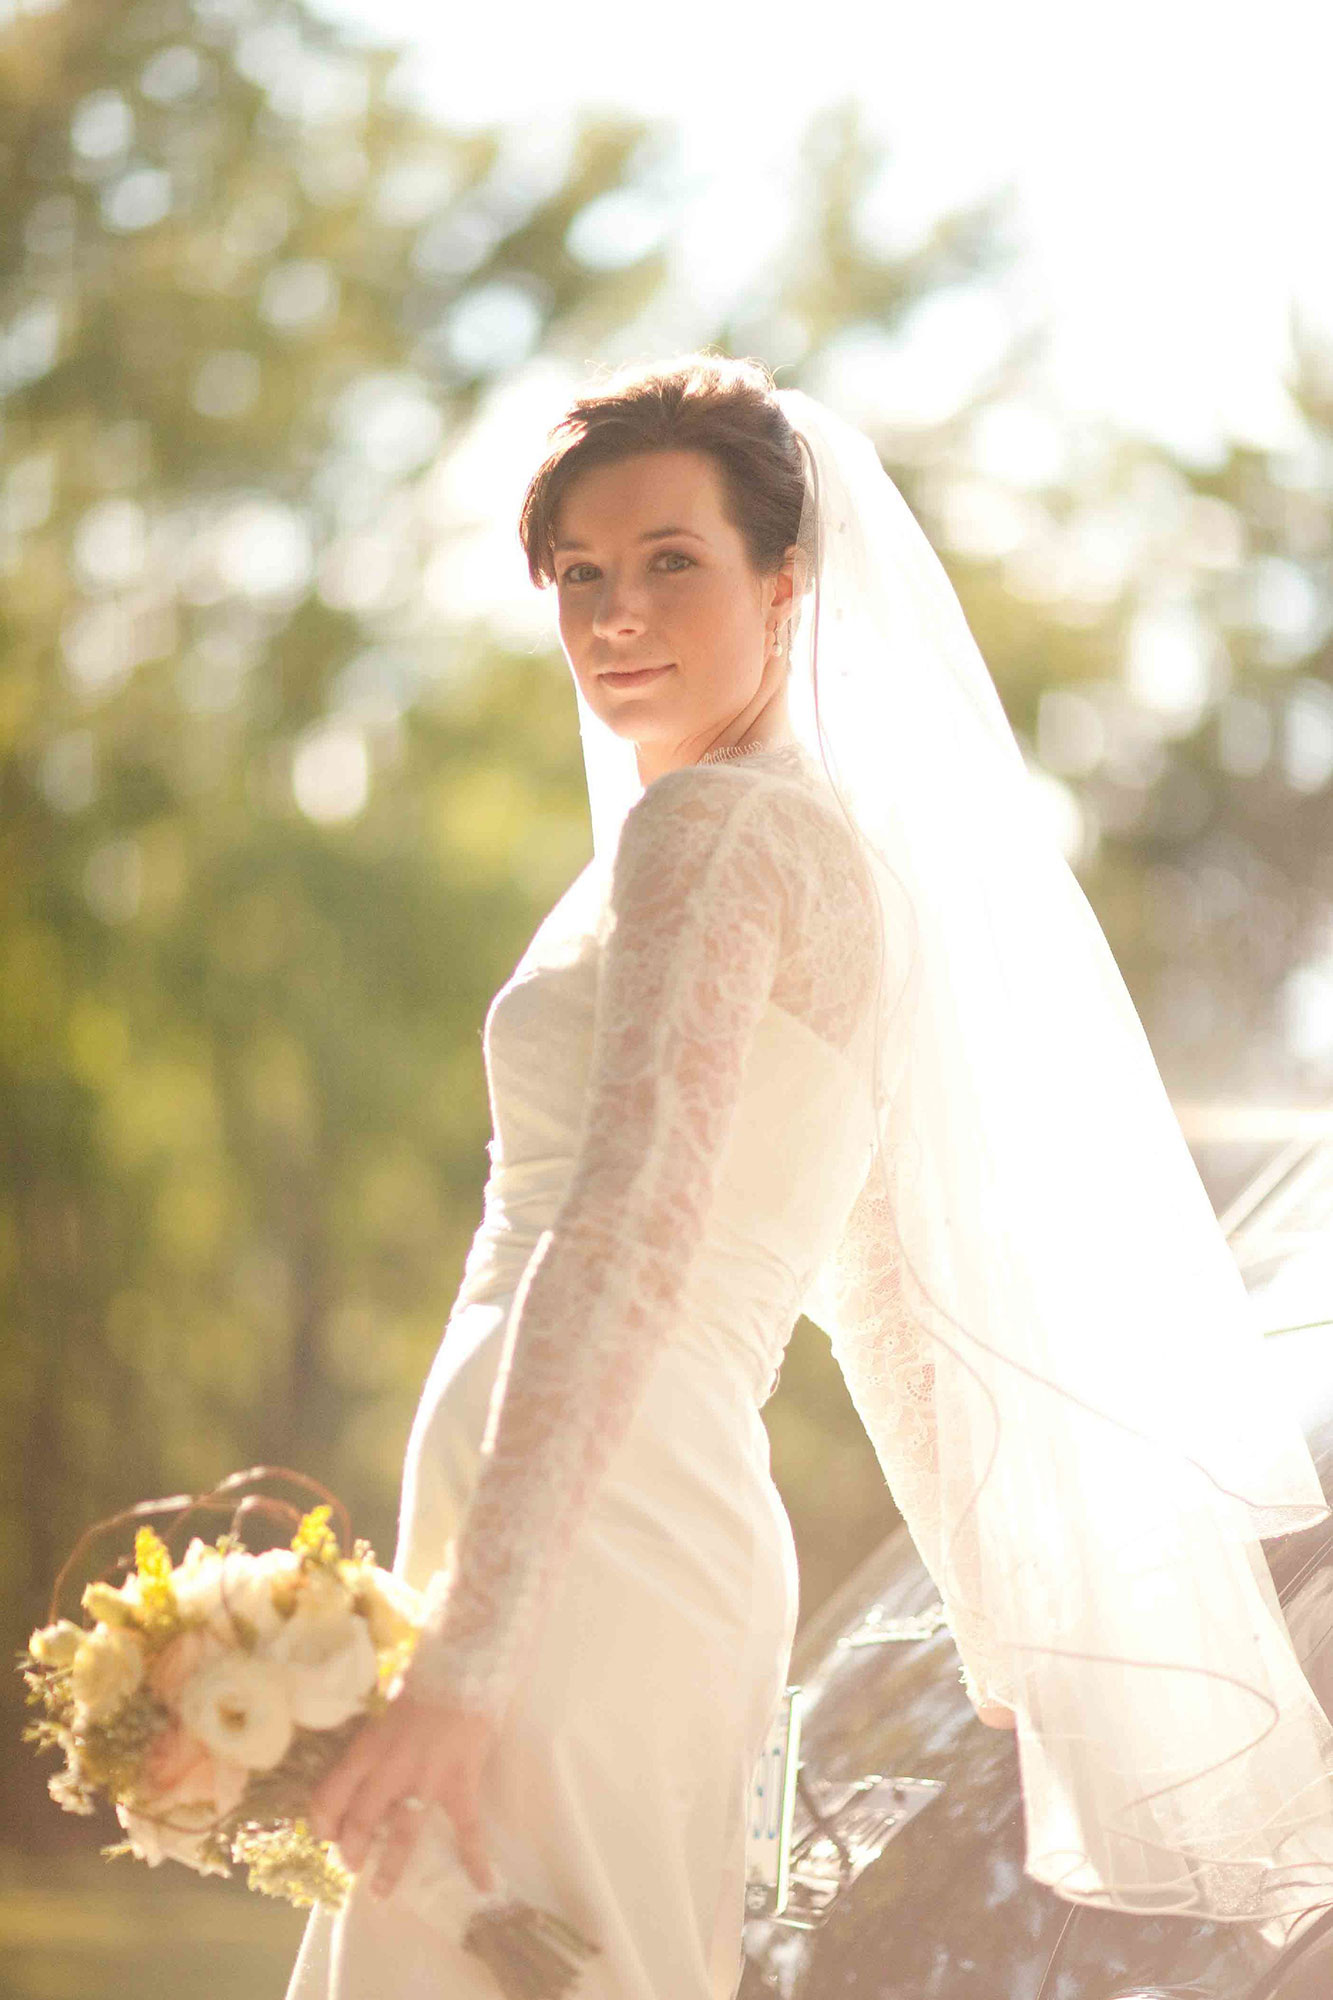 Amanda-Cowley-Willowbank-Vineyard-Bride-Photo-By-White-Photographie-027.jpg